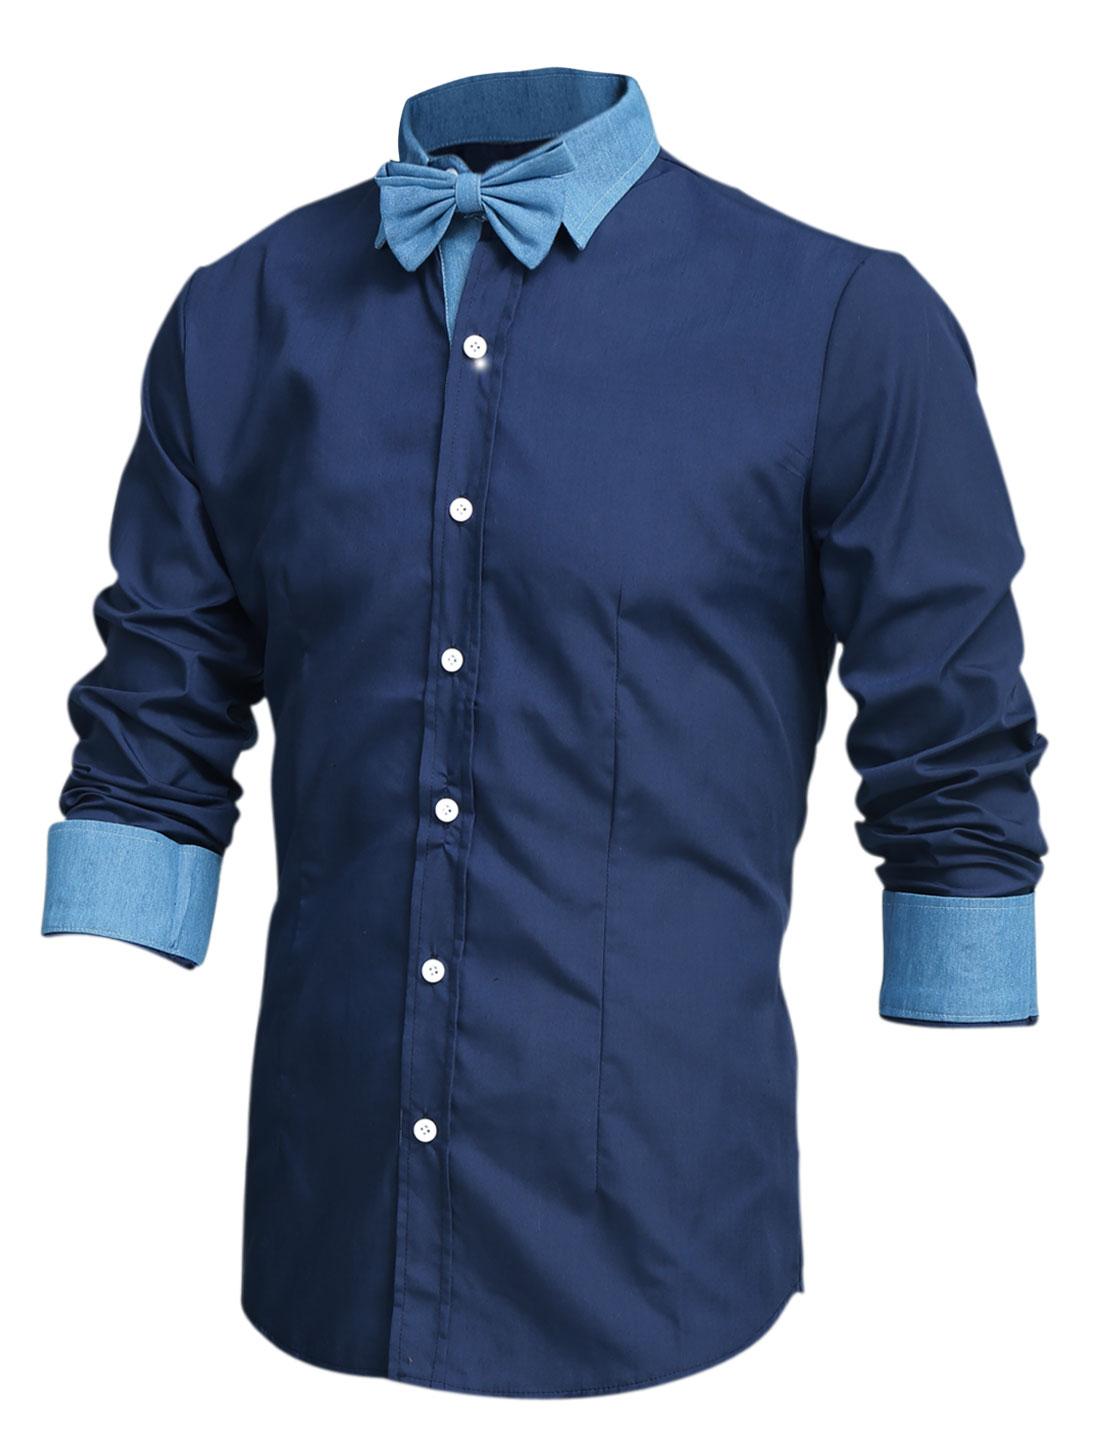 Men Color Block Spliced Slim Shirt w Removable Bow Tie Navy Blue M